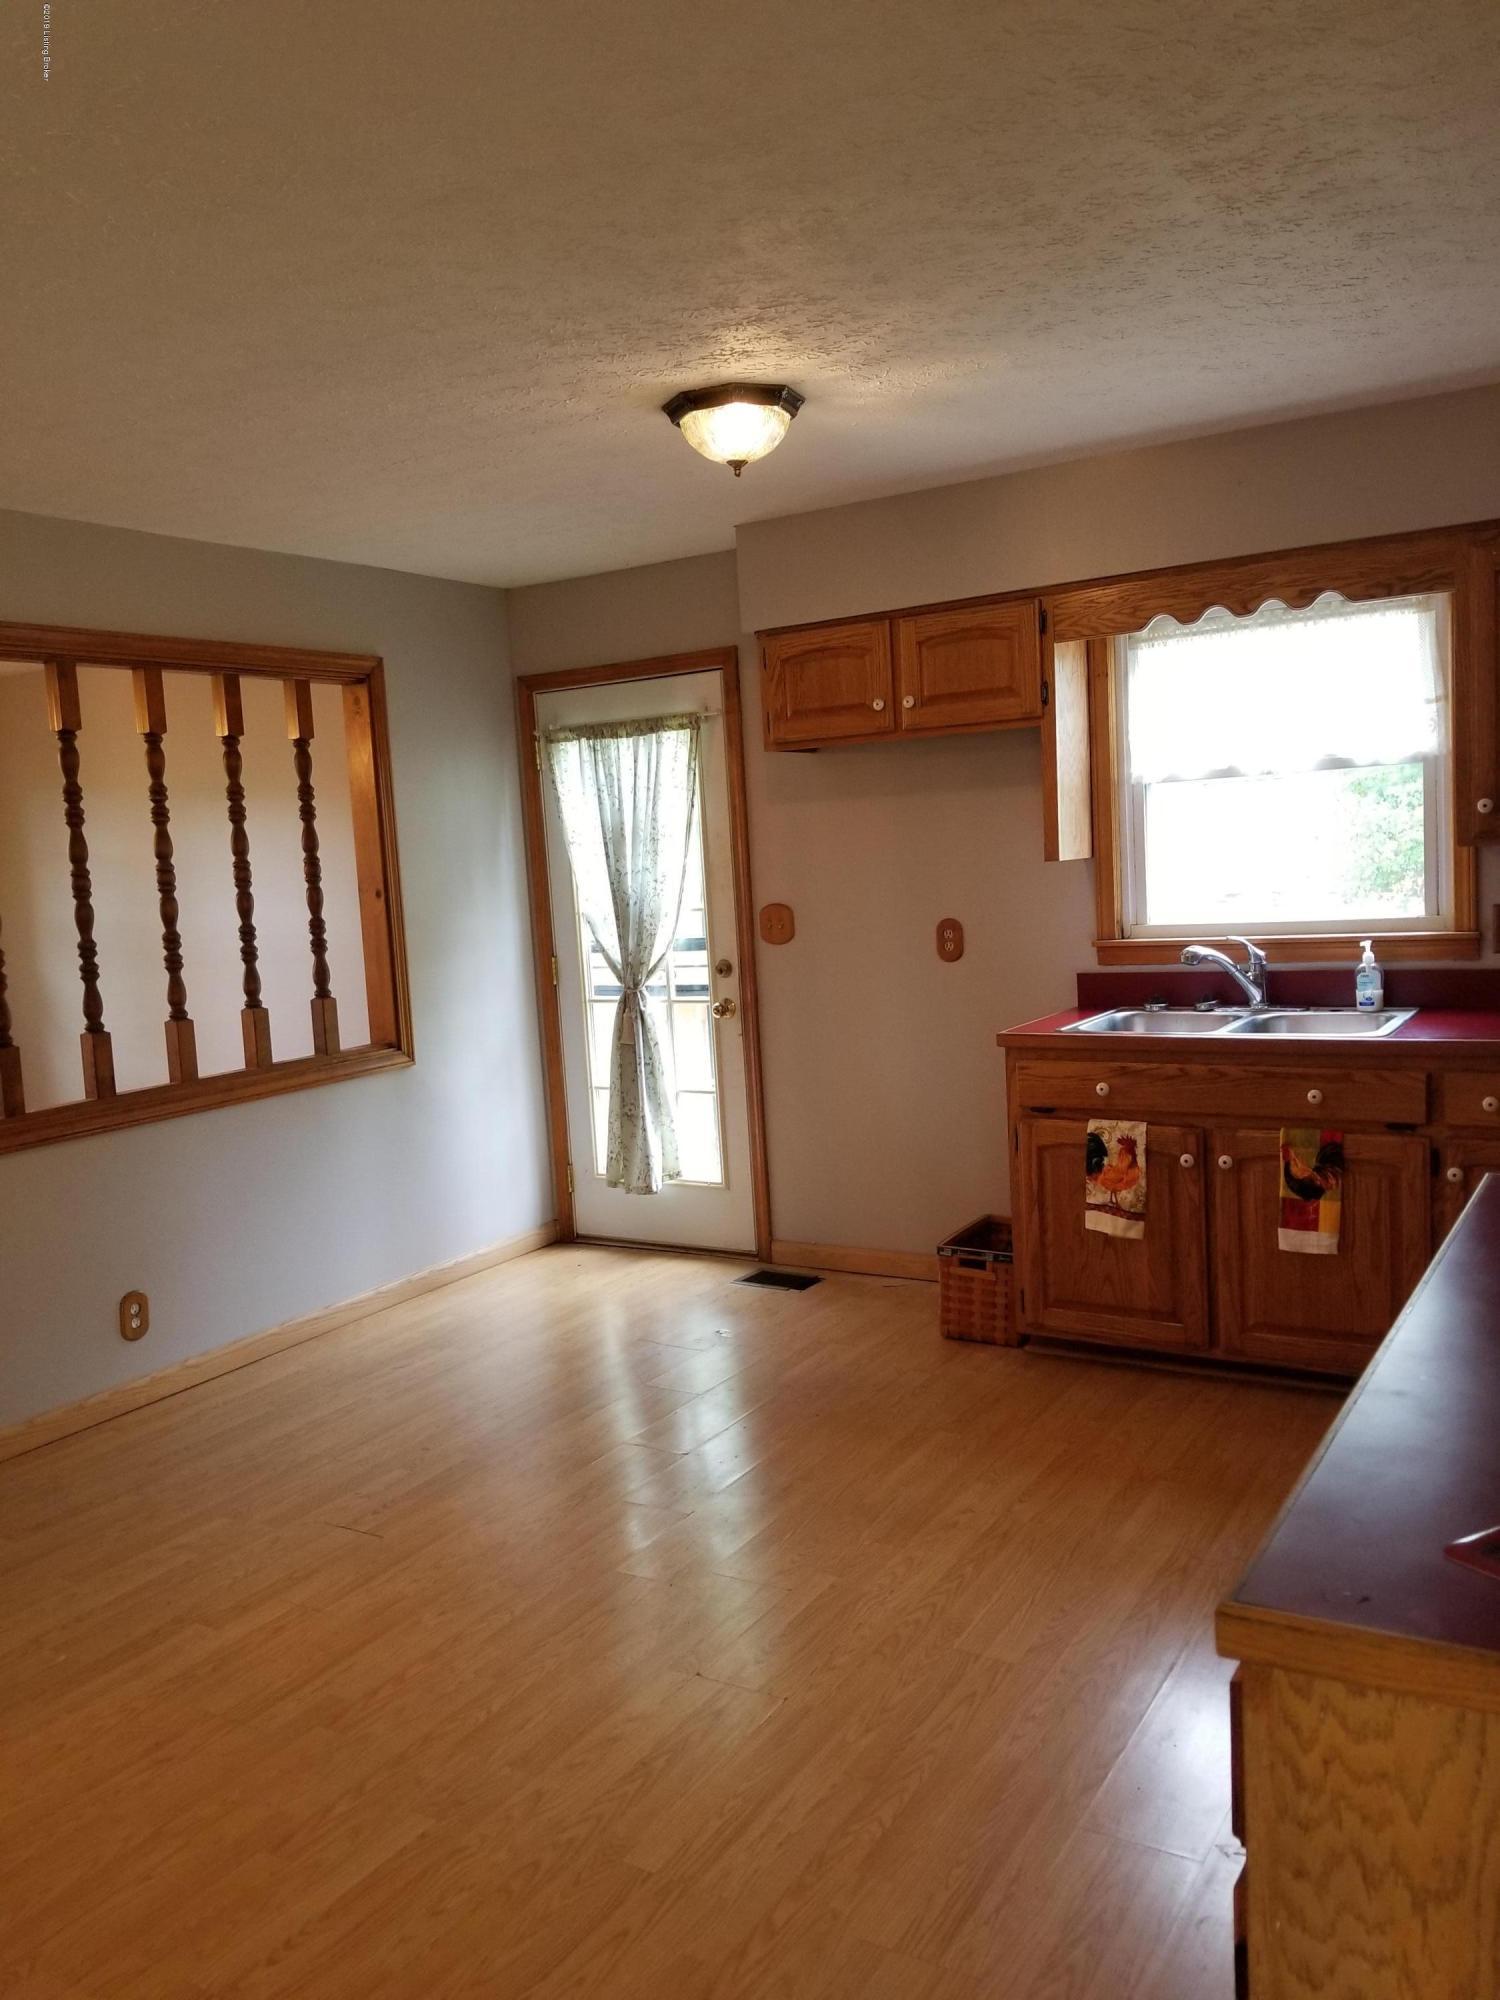 315 Saint Gregory Church Rd, Coxs Creek, Kentucky 40013, 3 Bedrooms Bedrooms, 6 Rooms Rooms,1 BathroomBathrooms,Residential,For Sale,Saint Gregory Church,1534054